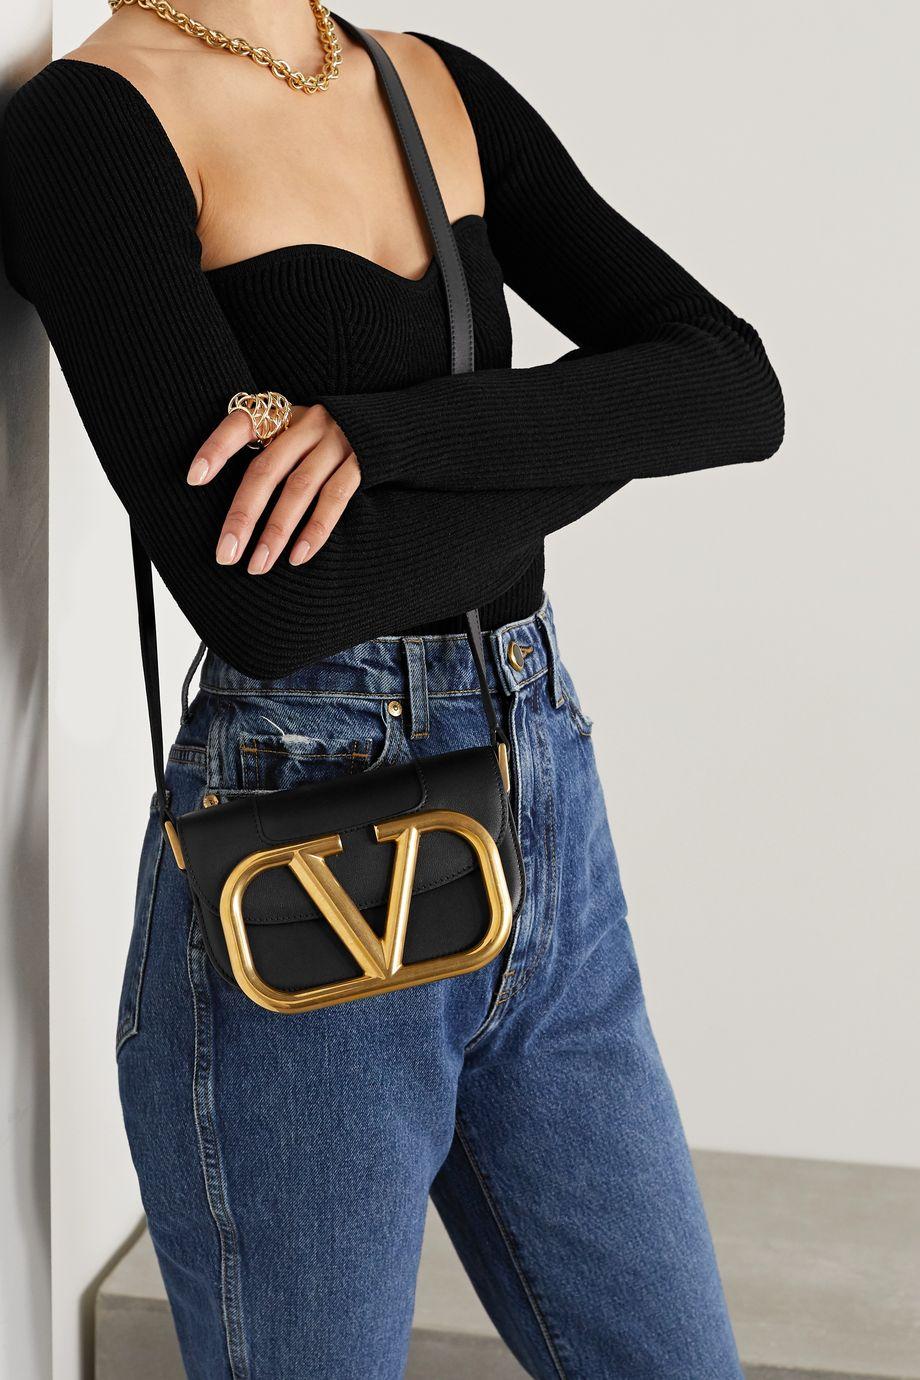 Valentino Valentino Garavani Supervee small leather shoulder bag